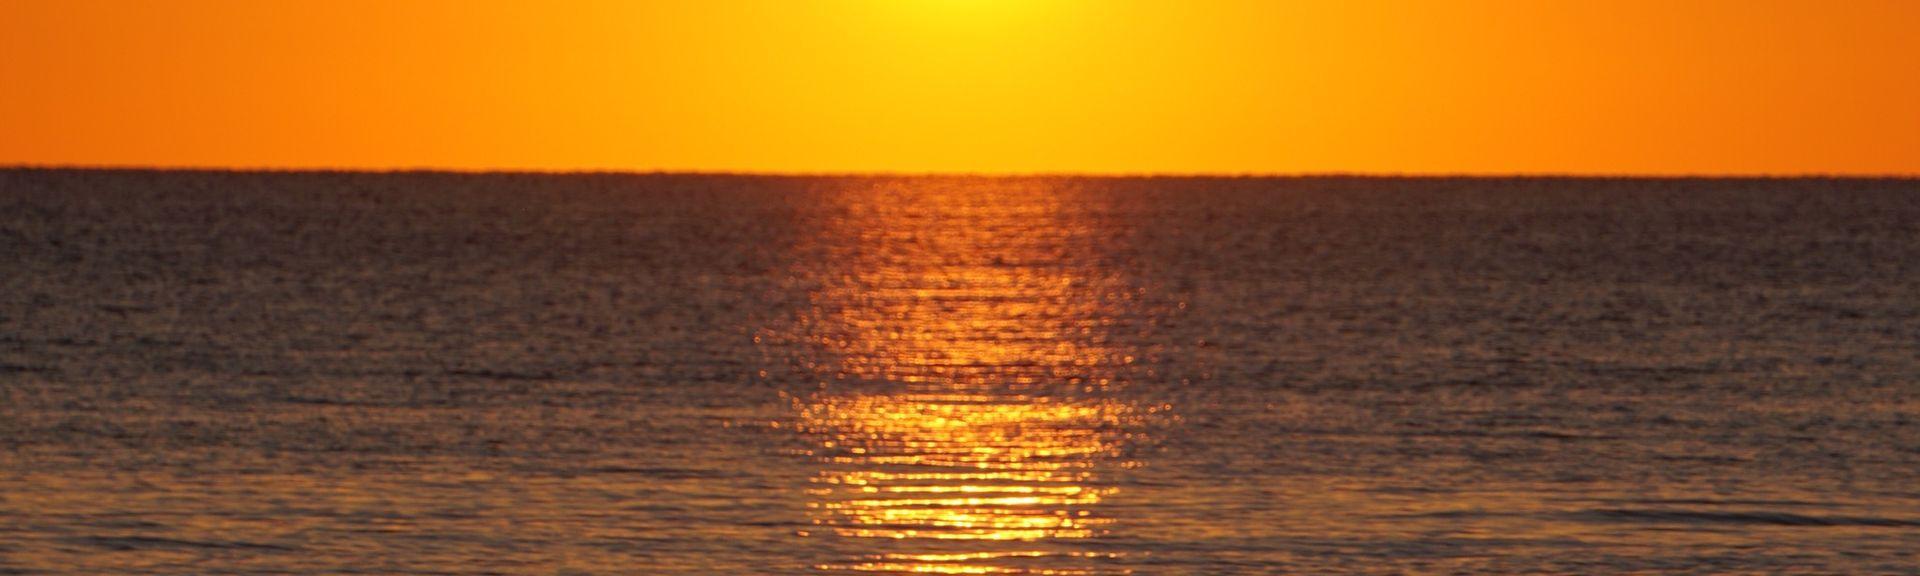 Island Sands, Fort Walton Beach, Florida, United States of America